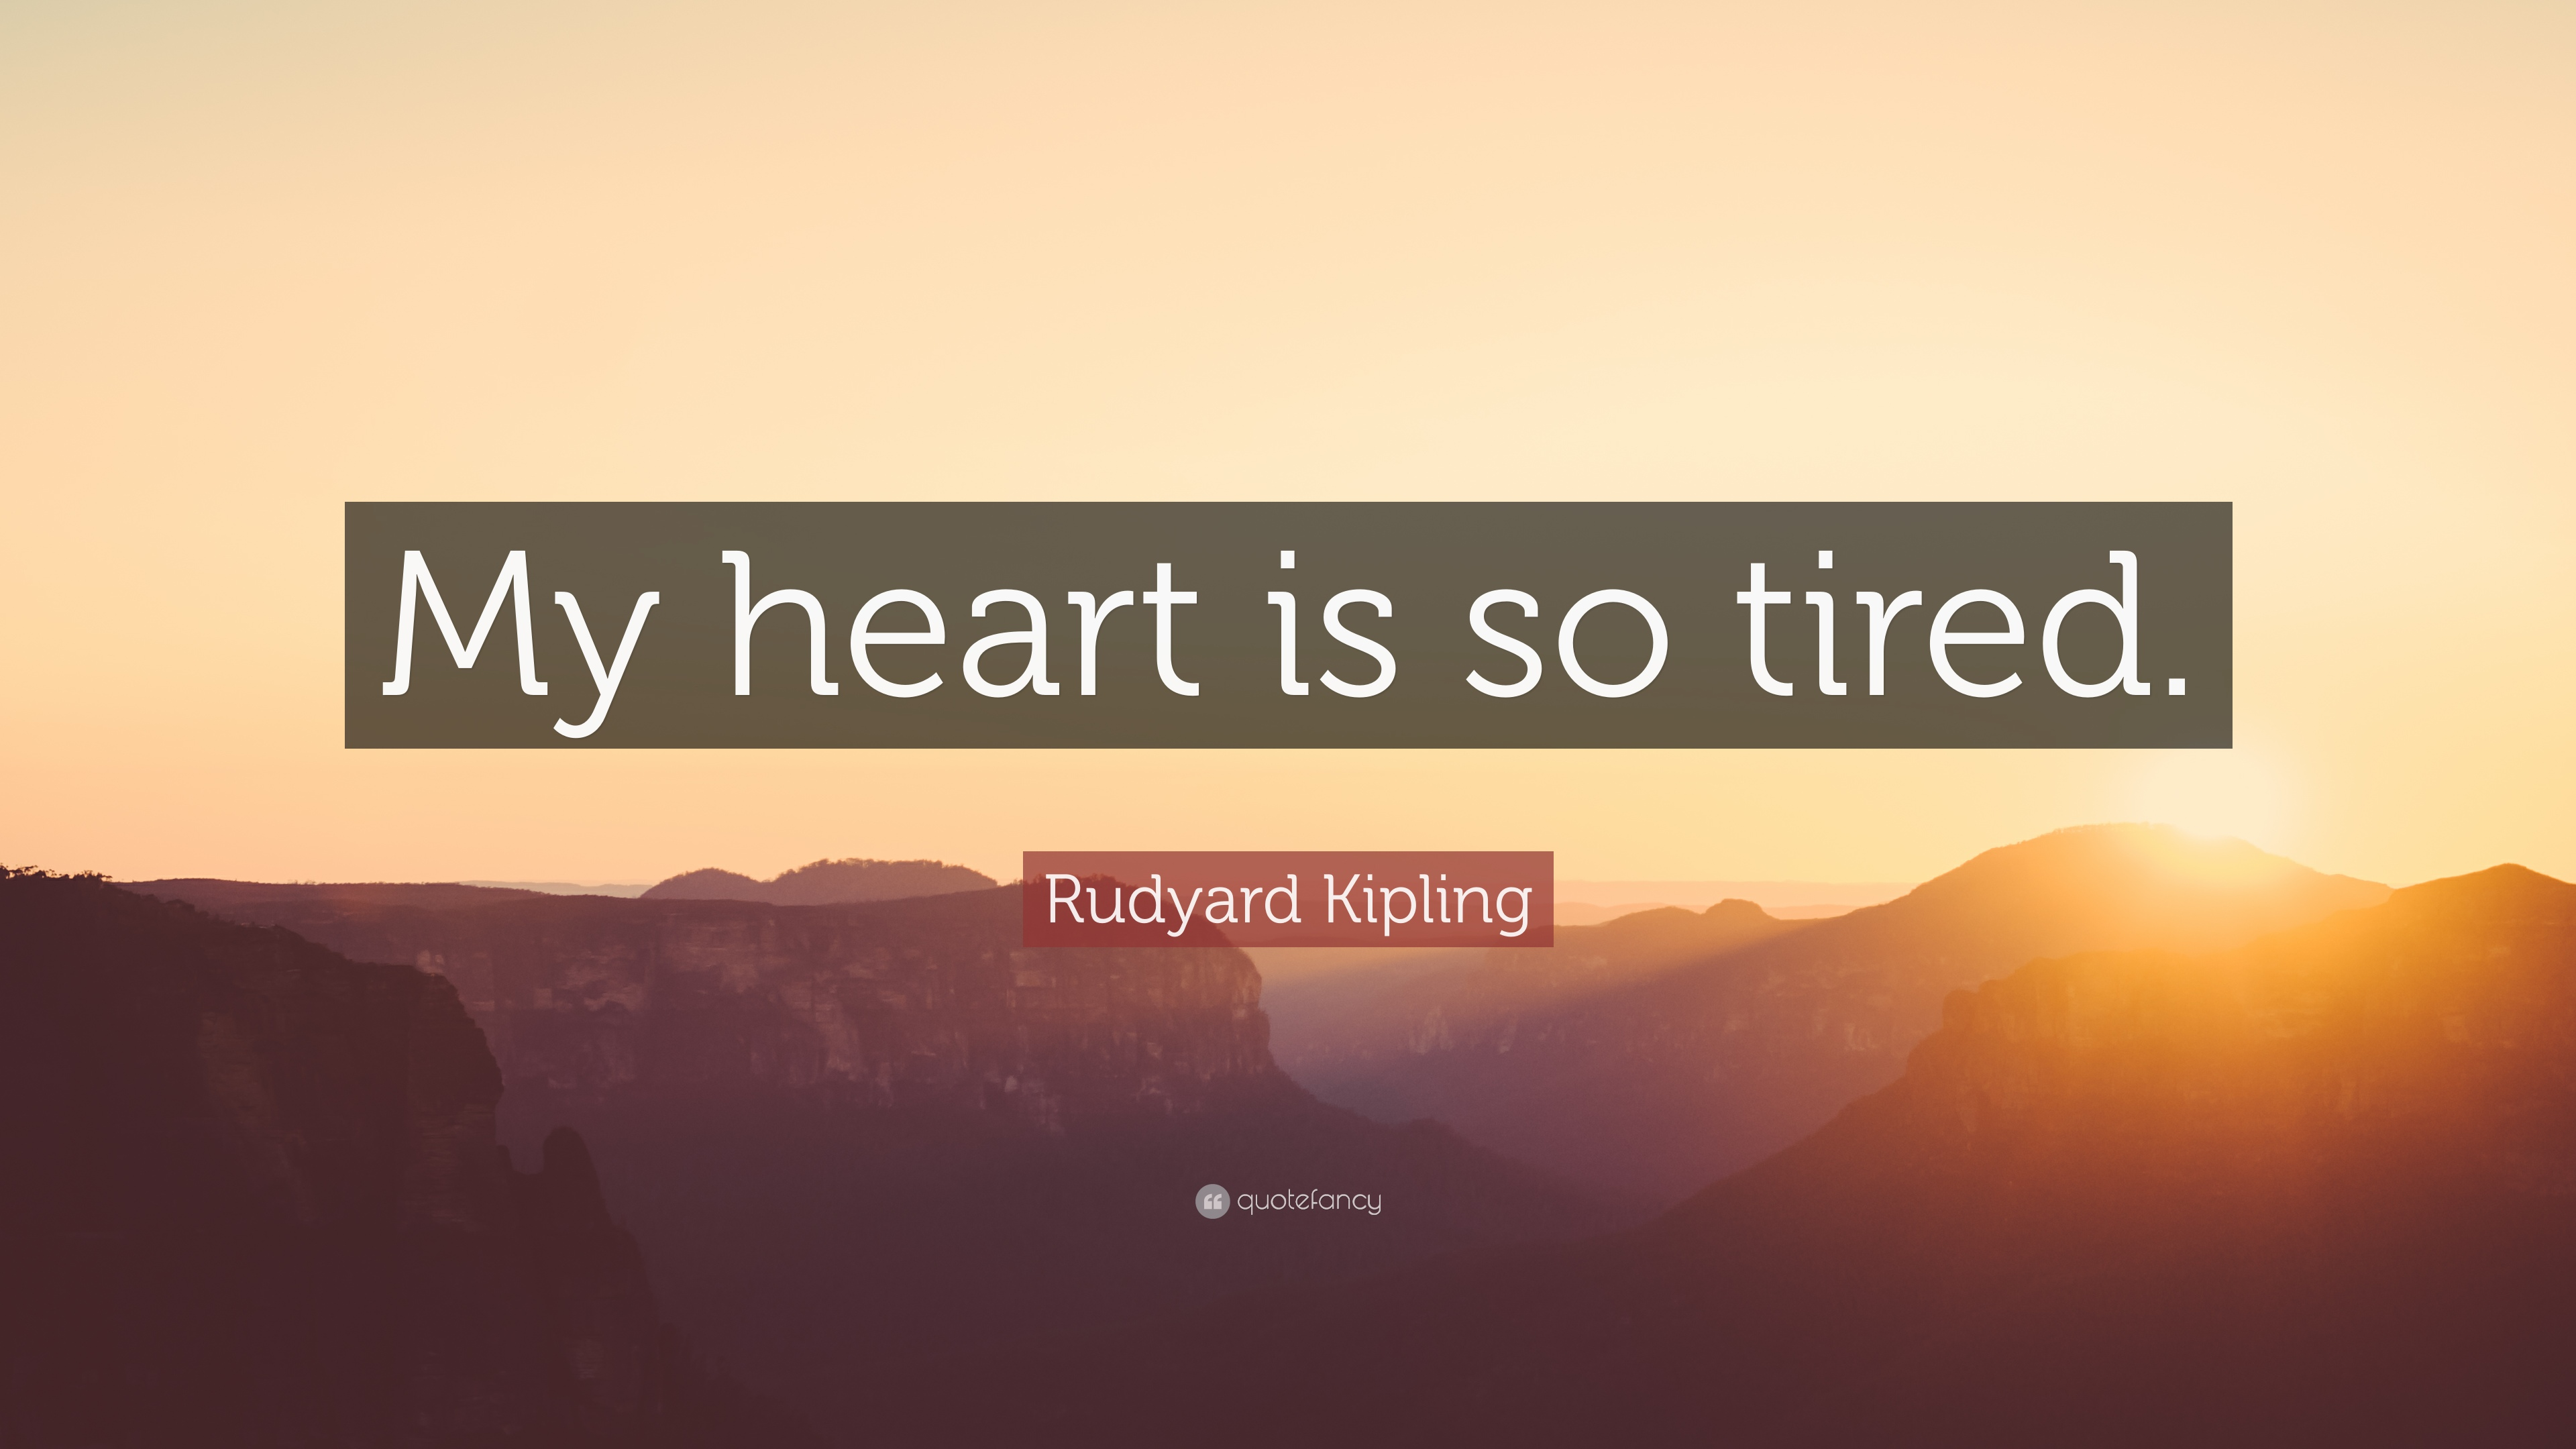 Rudyard Kipling Quote: My heart is so tired. (12